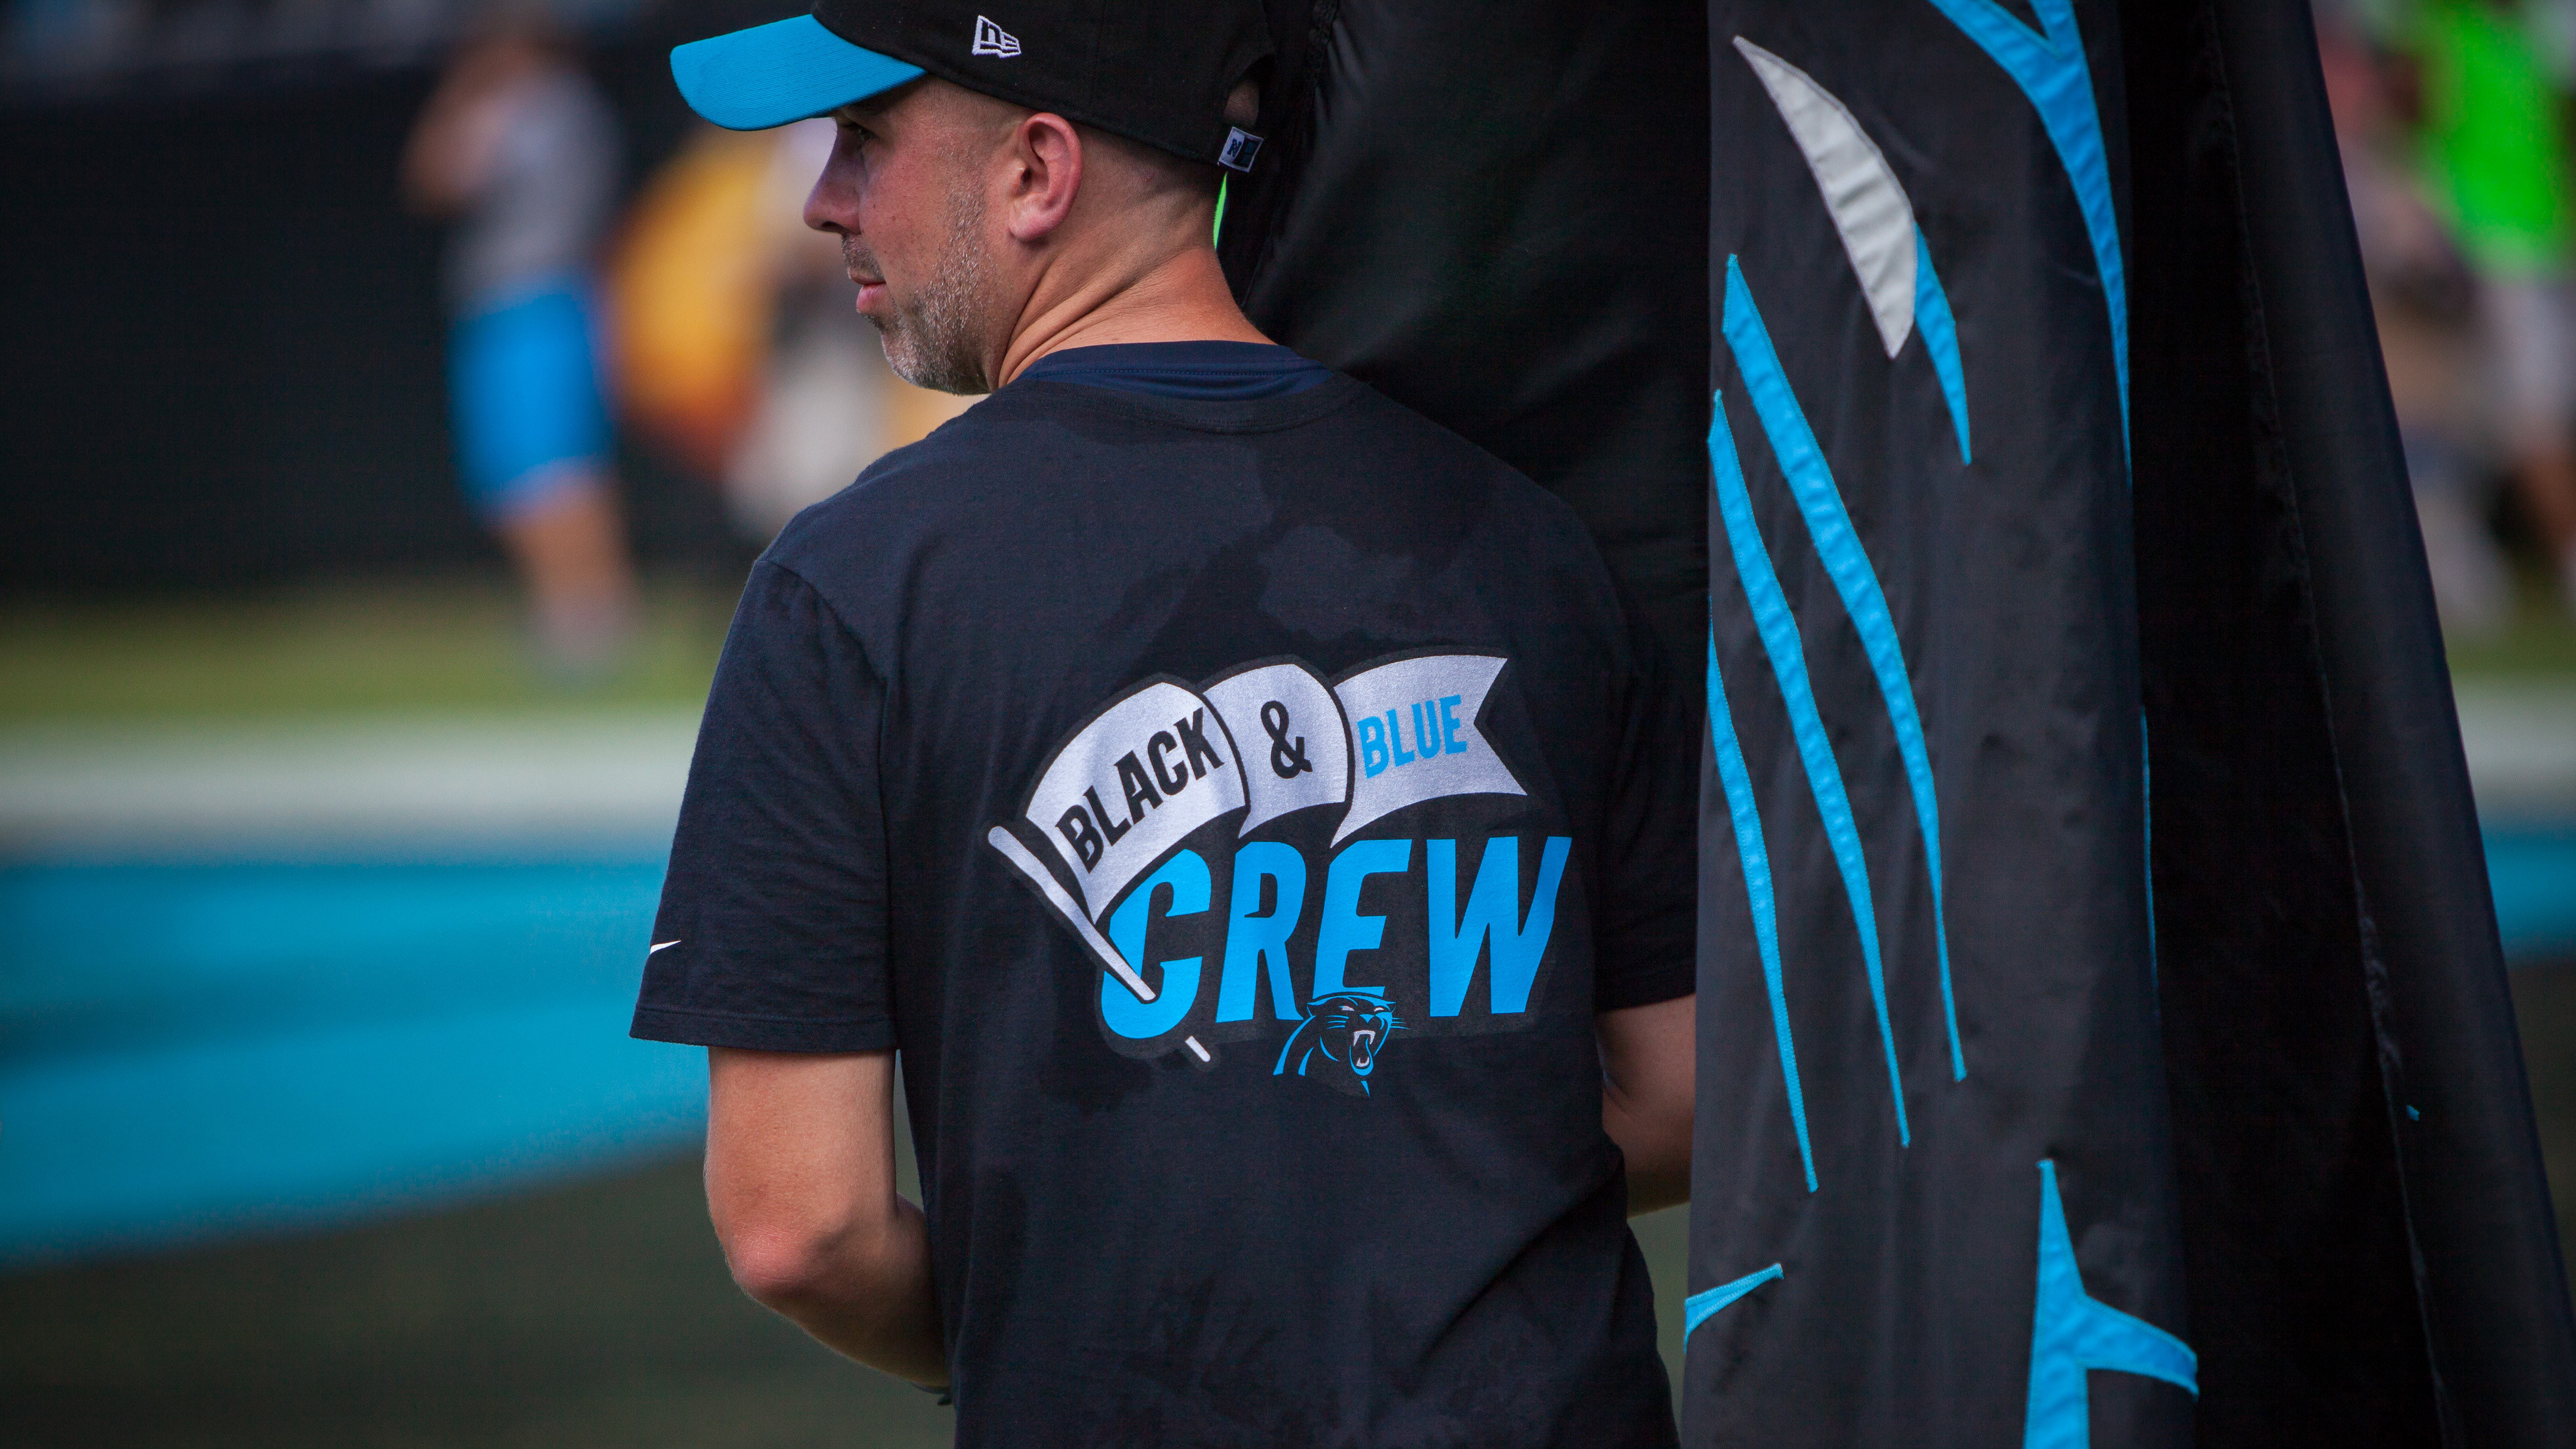 Black & Blue Crew